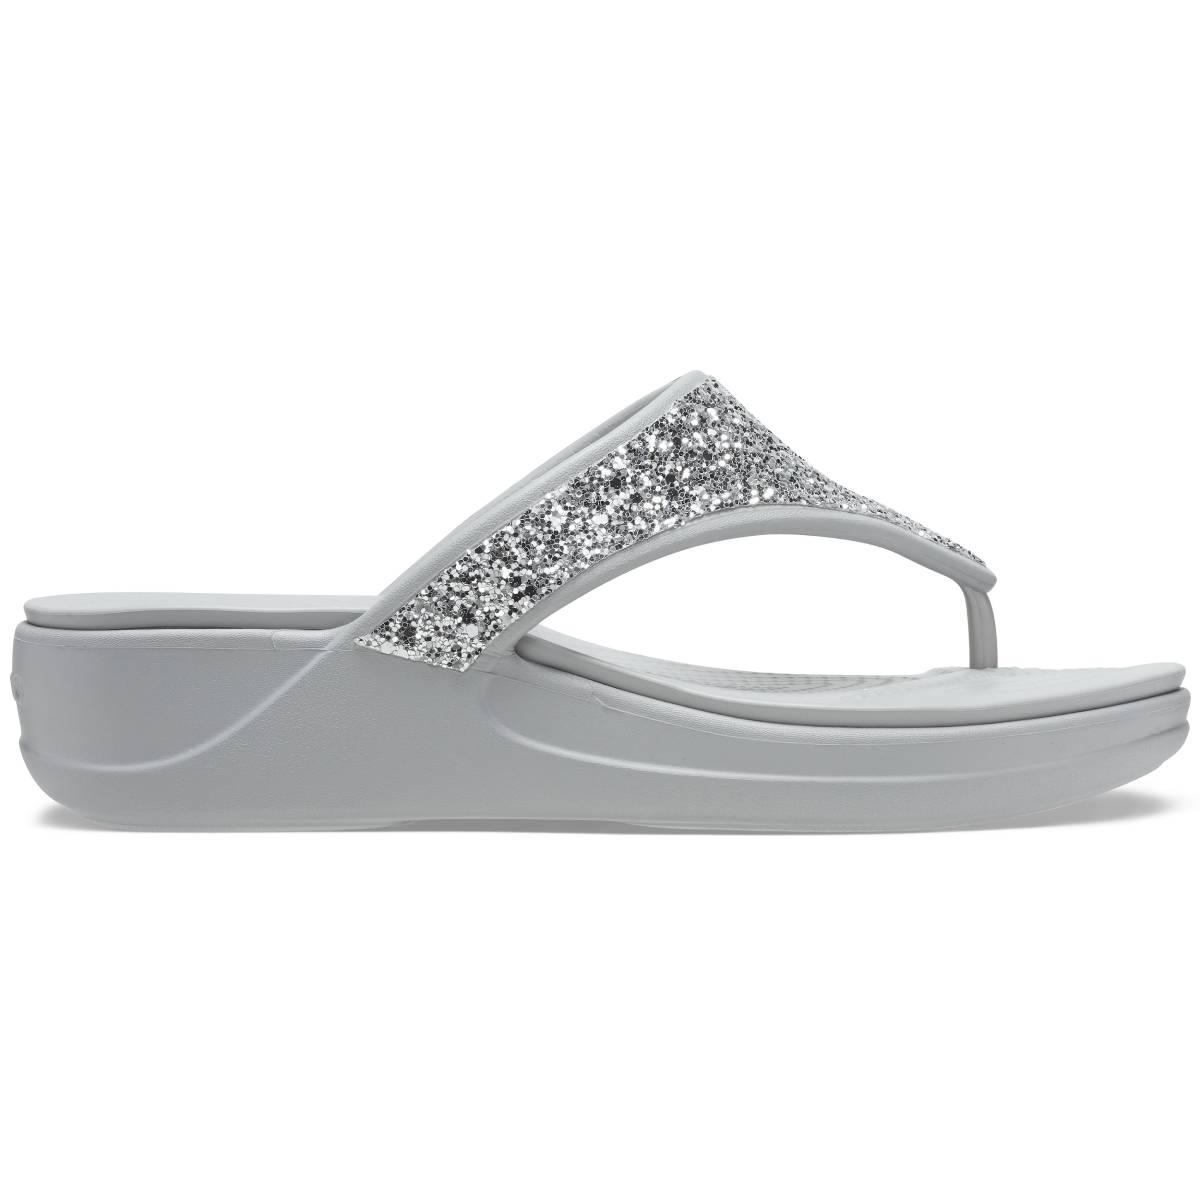 Crocs Monterey Glitter WgFp - Gümüş